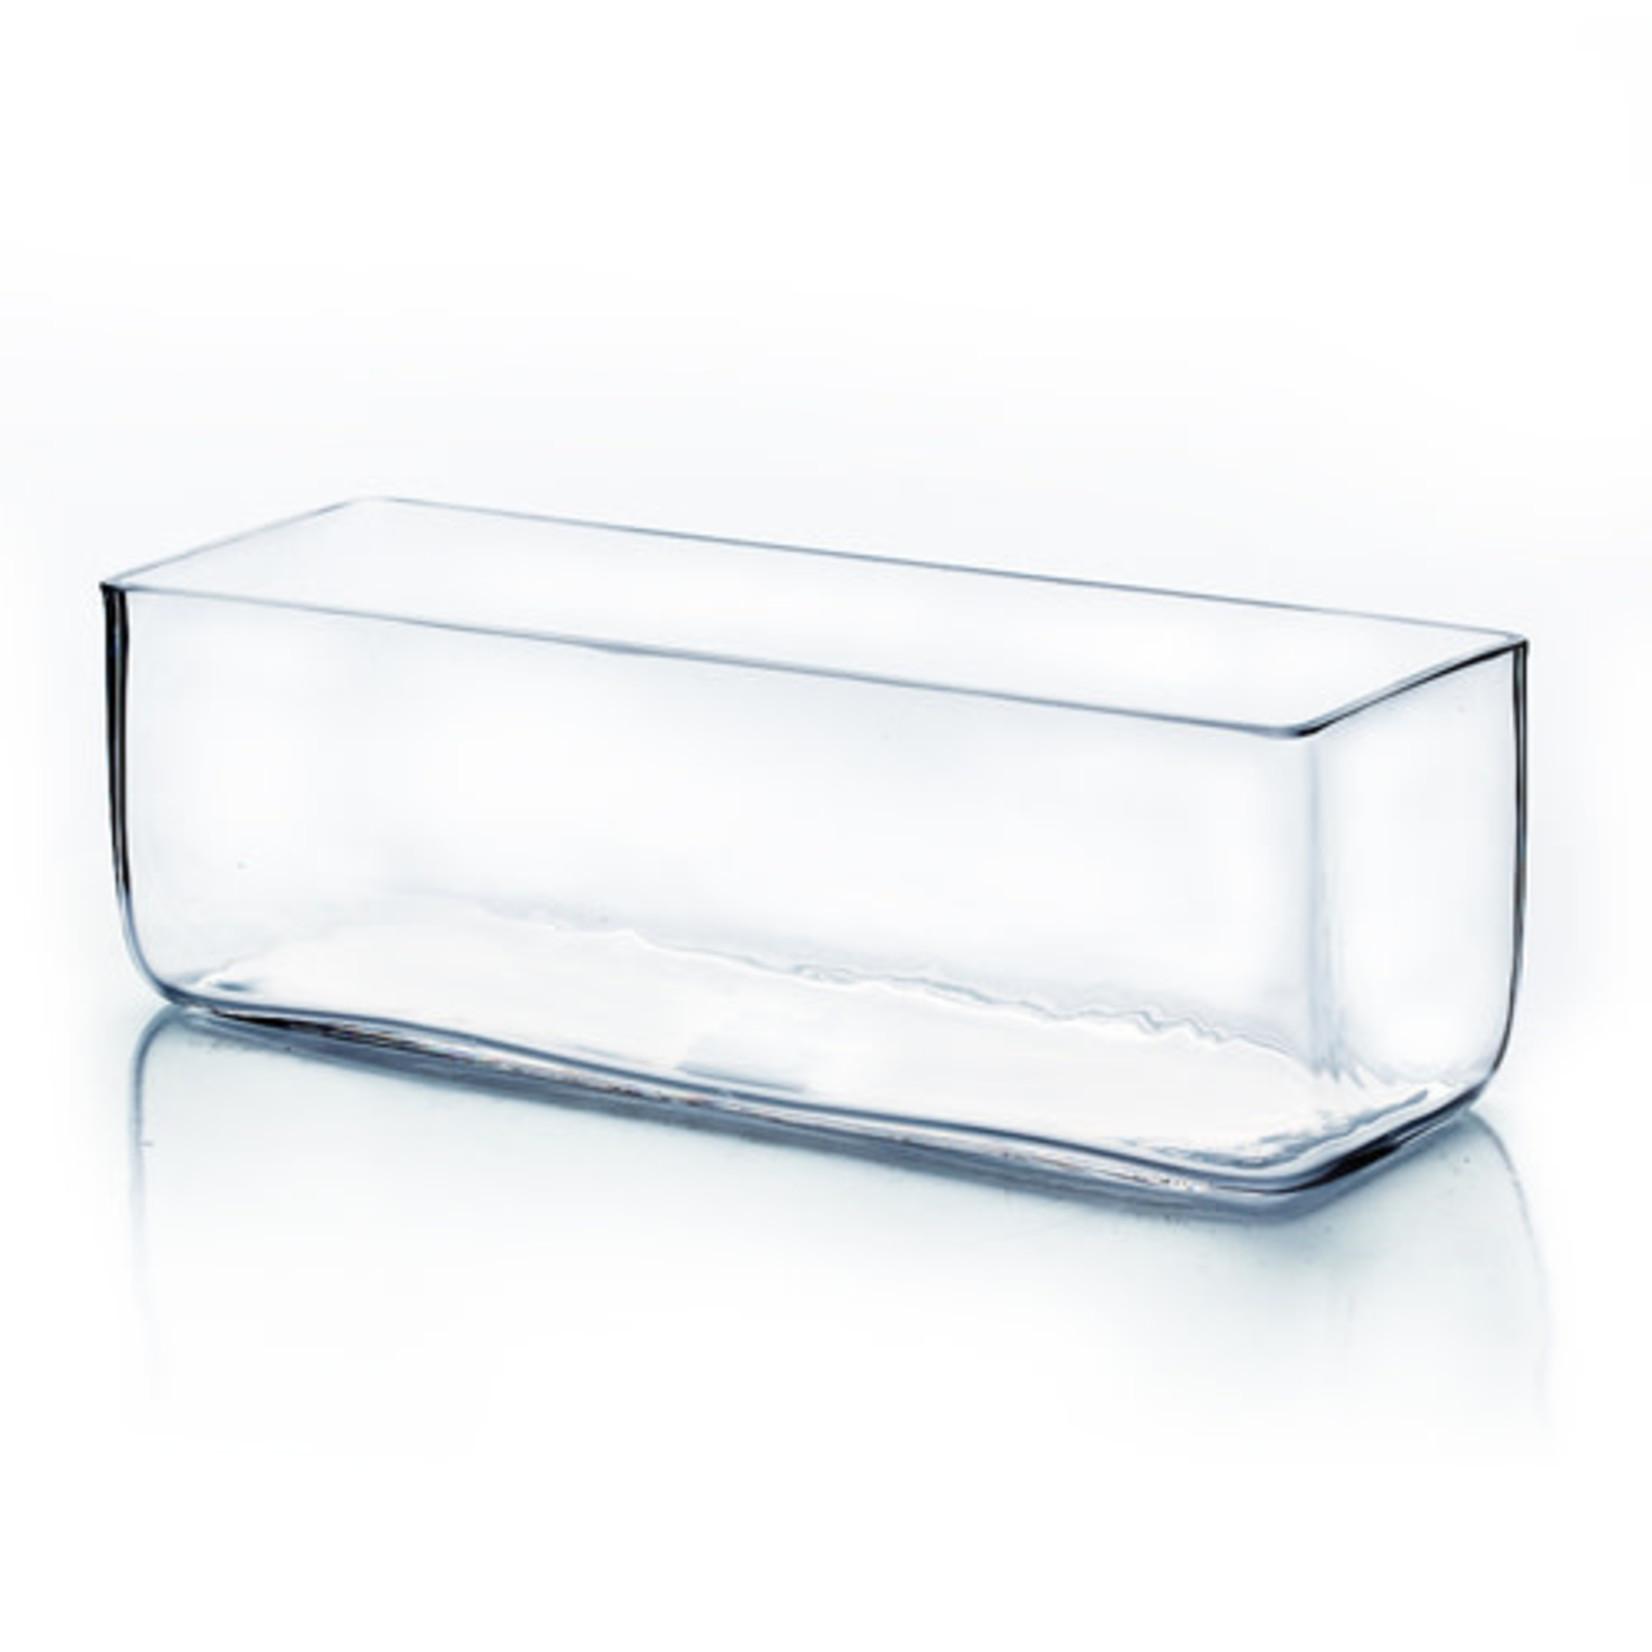 "14""L X 4""H X 4""W LOW RECTANGLE GLASS VASE"